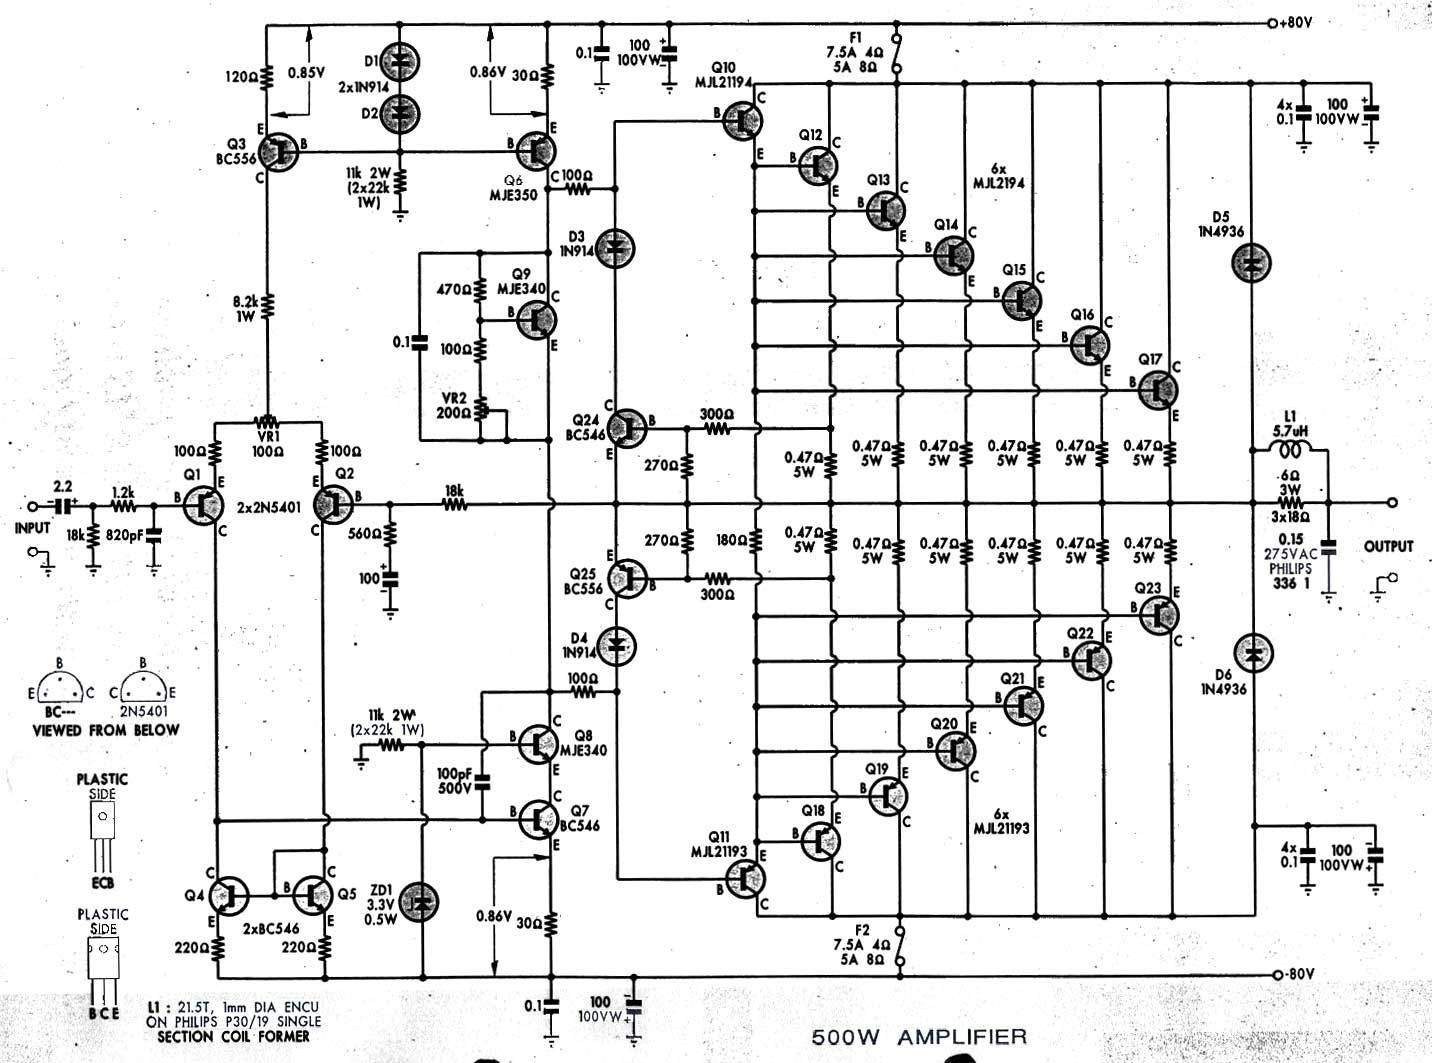 [AW_7960] Cyrus 1 Circuit Diagram Free Diagram